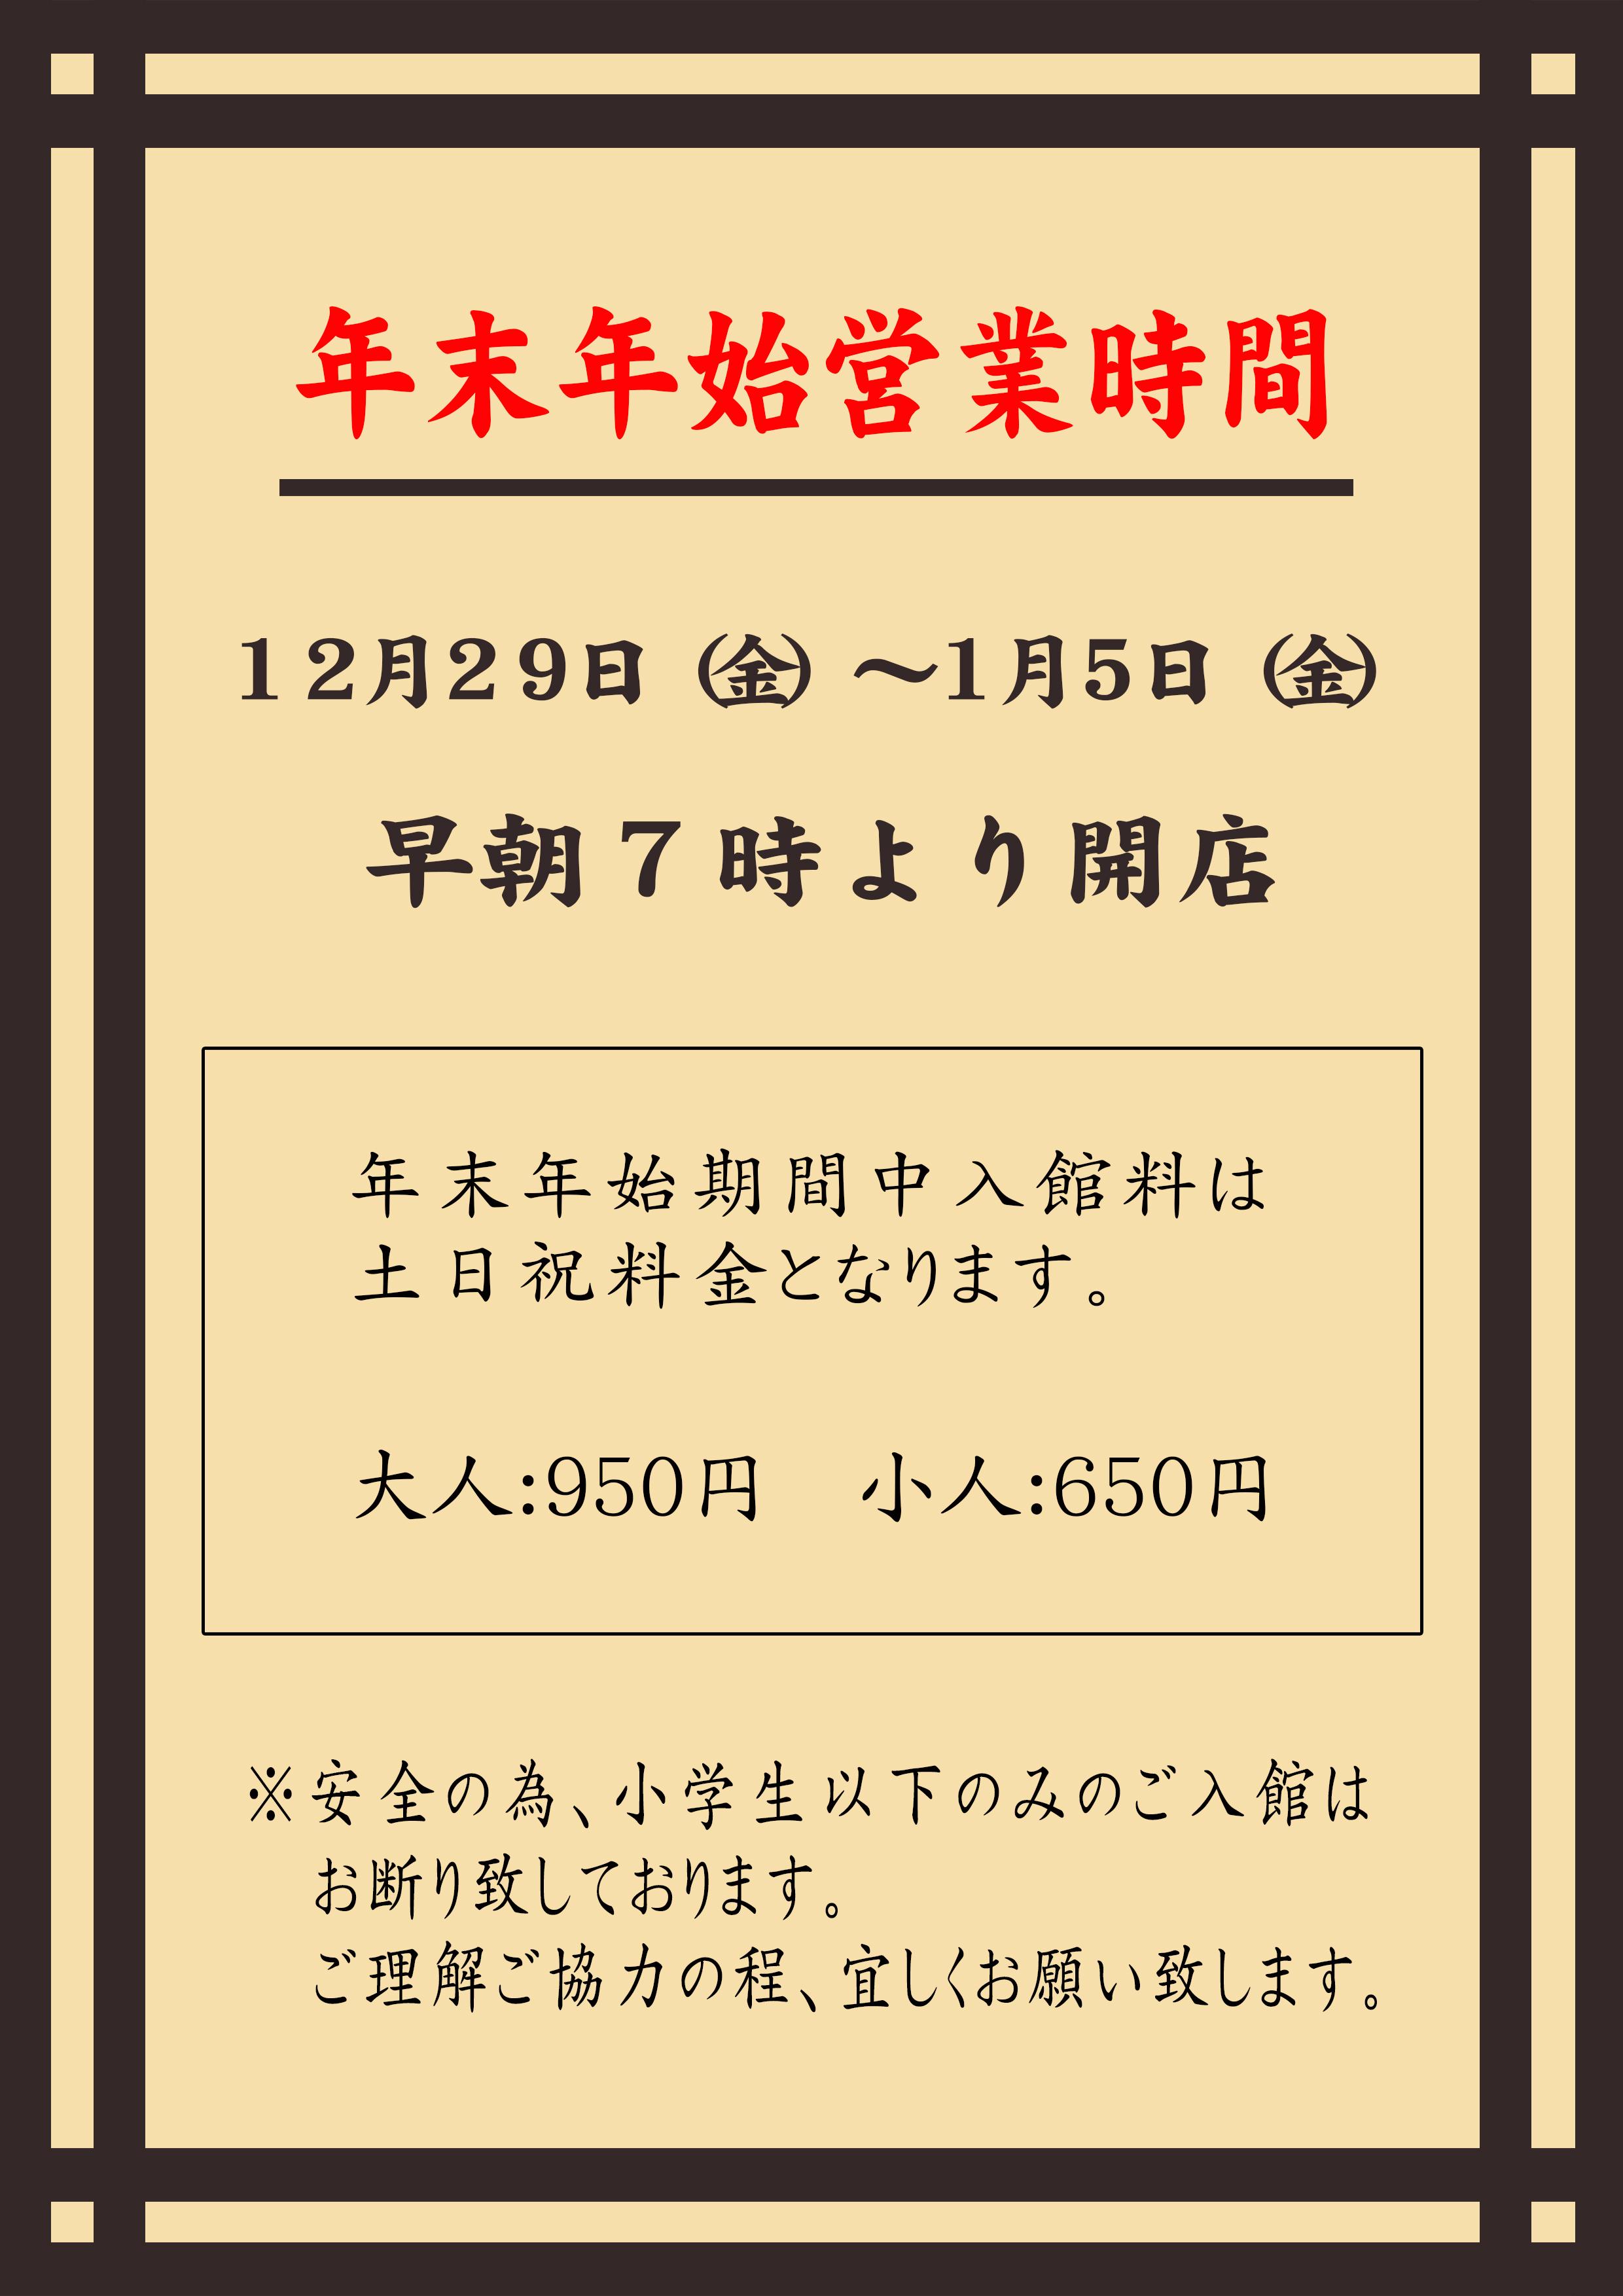 POP イベント 12月 年末年始 注意書き2